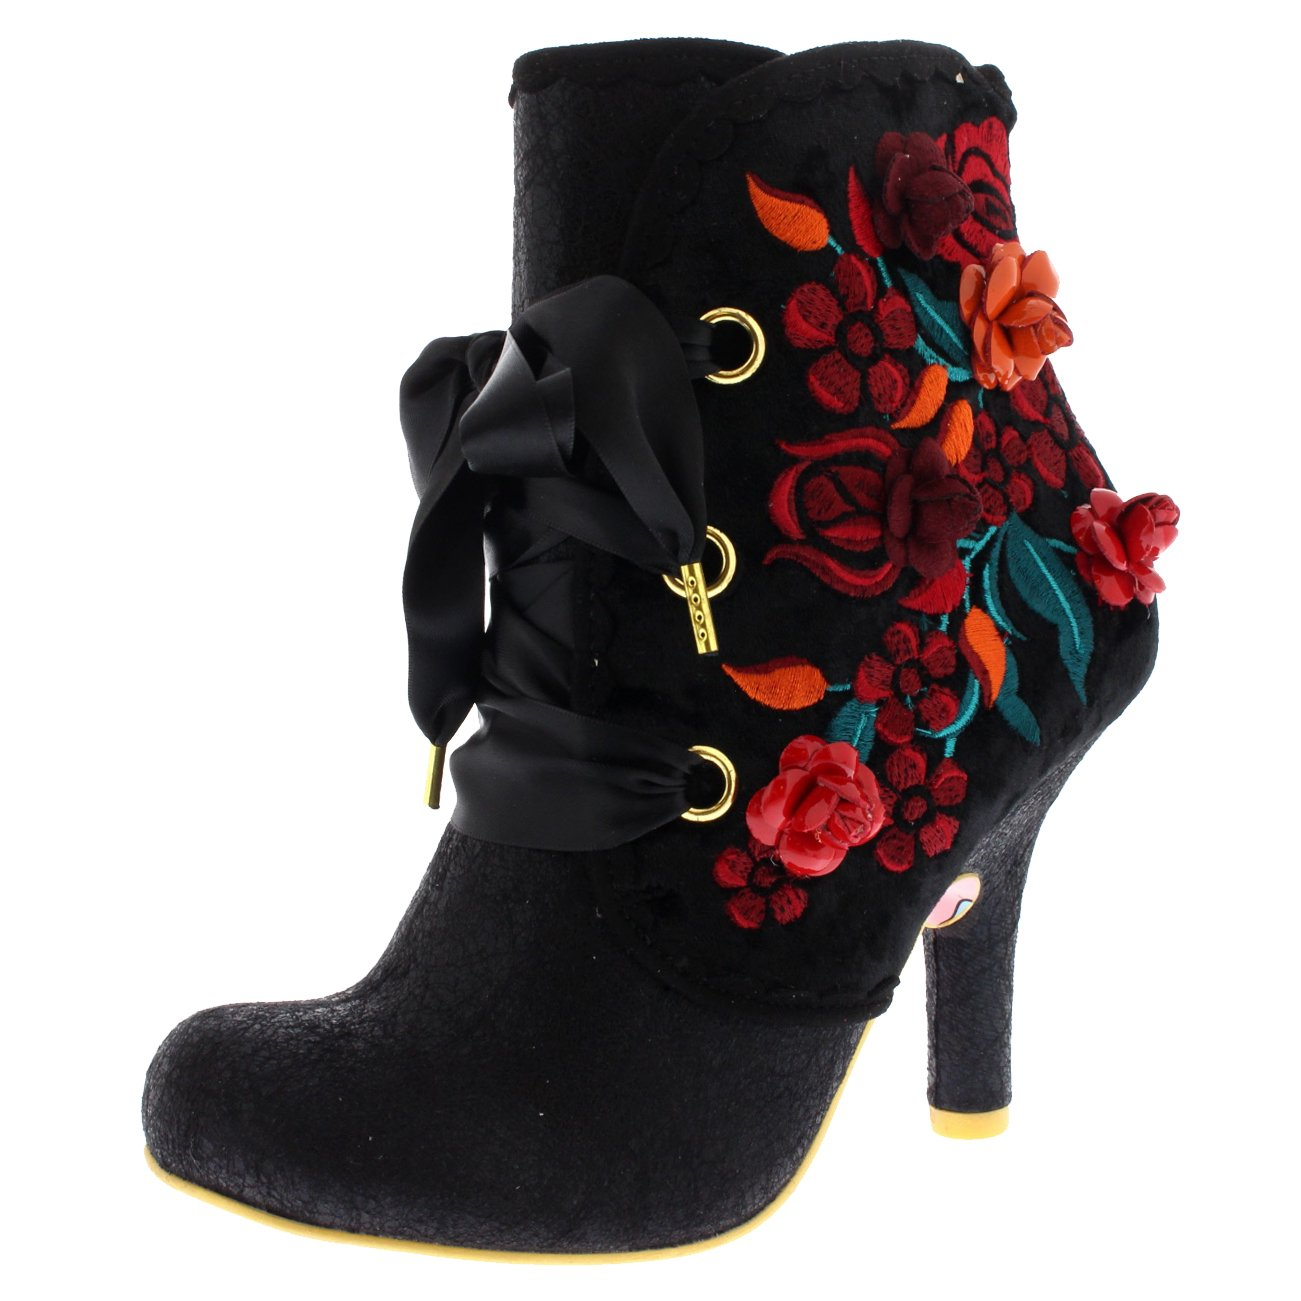 Irregular Choice Womens Autumn Harvest Floral High Heels Ankle Boot - Black - 9